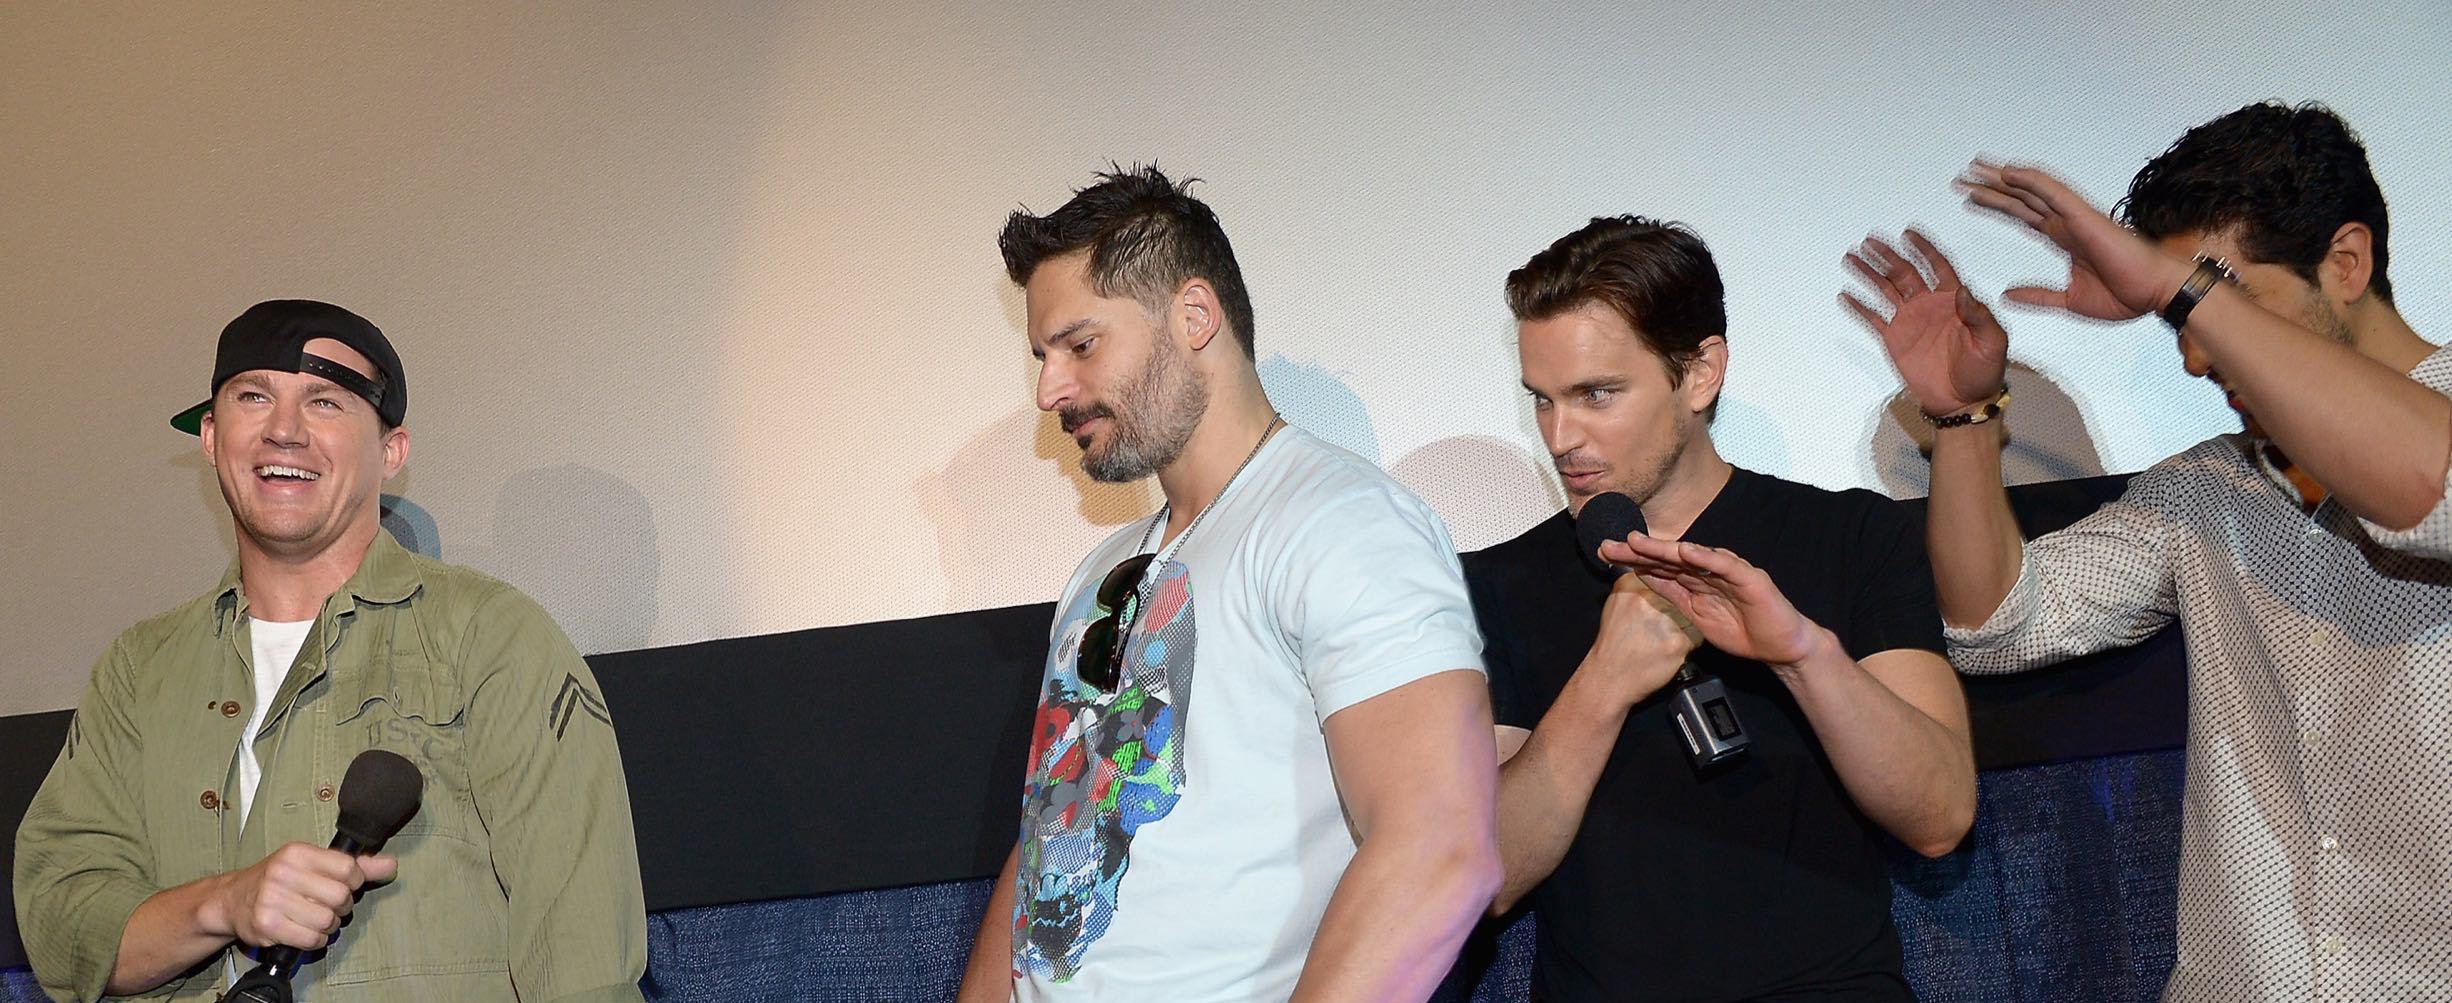 Tony cam chat